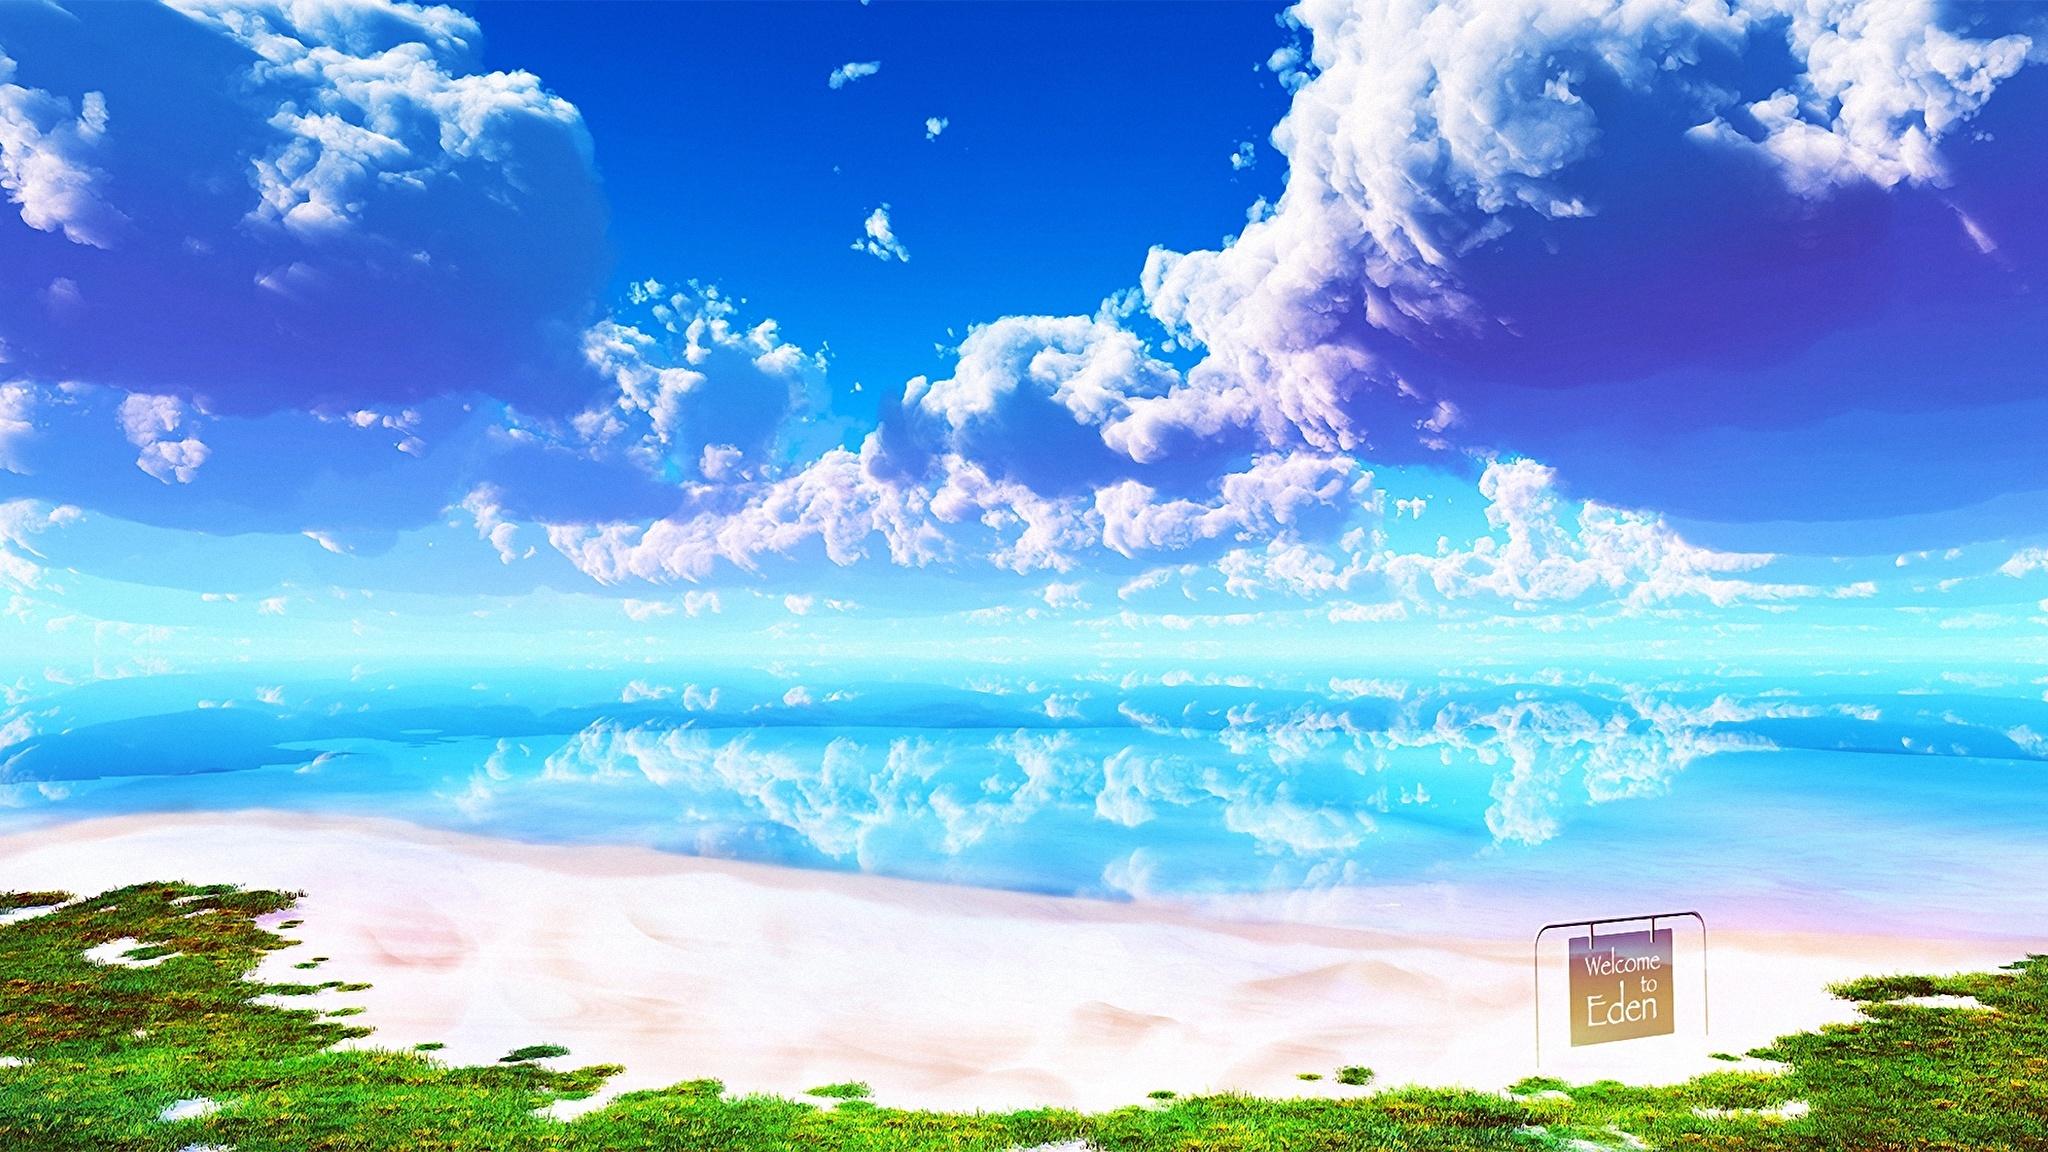 природа песок море горизонт небо облака  № 2577540 бесплатно